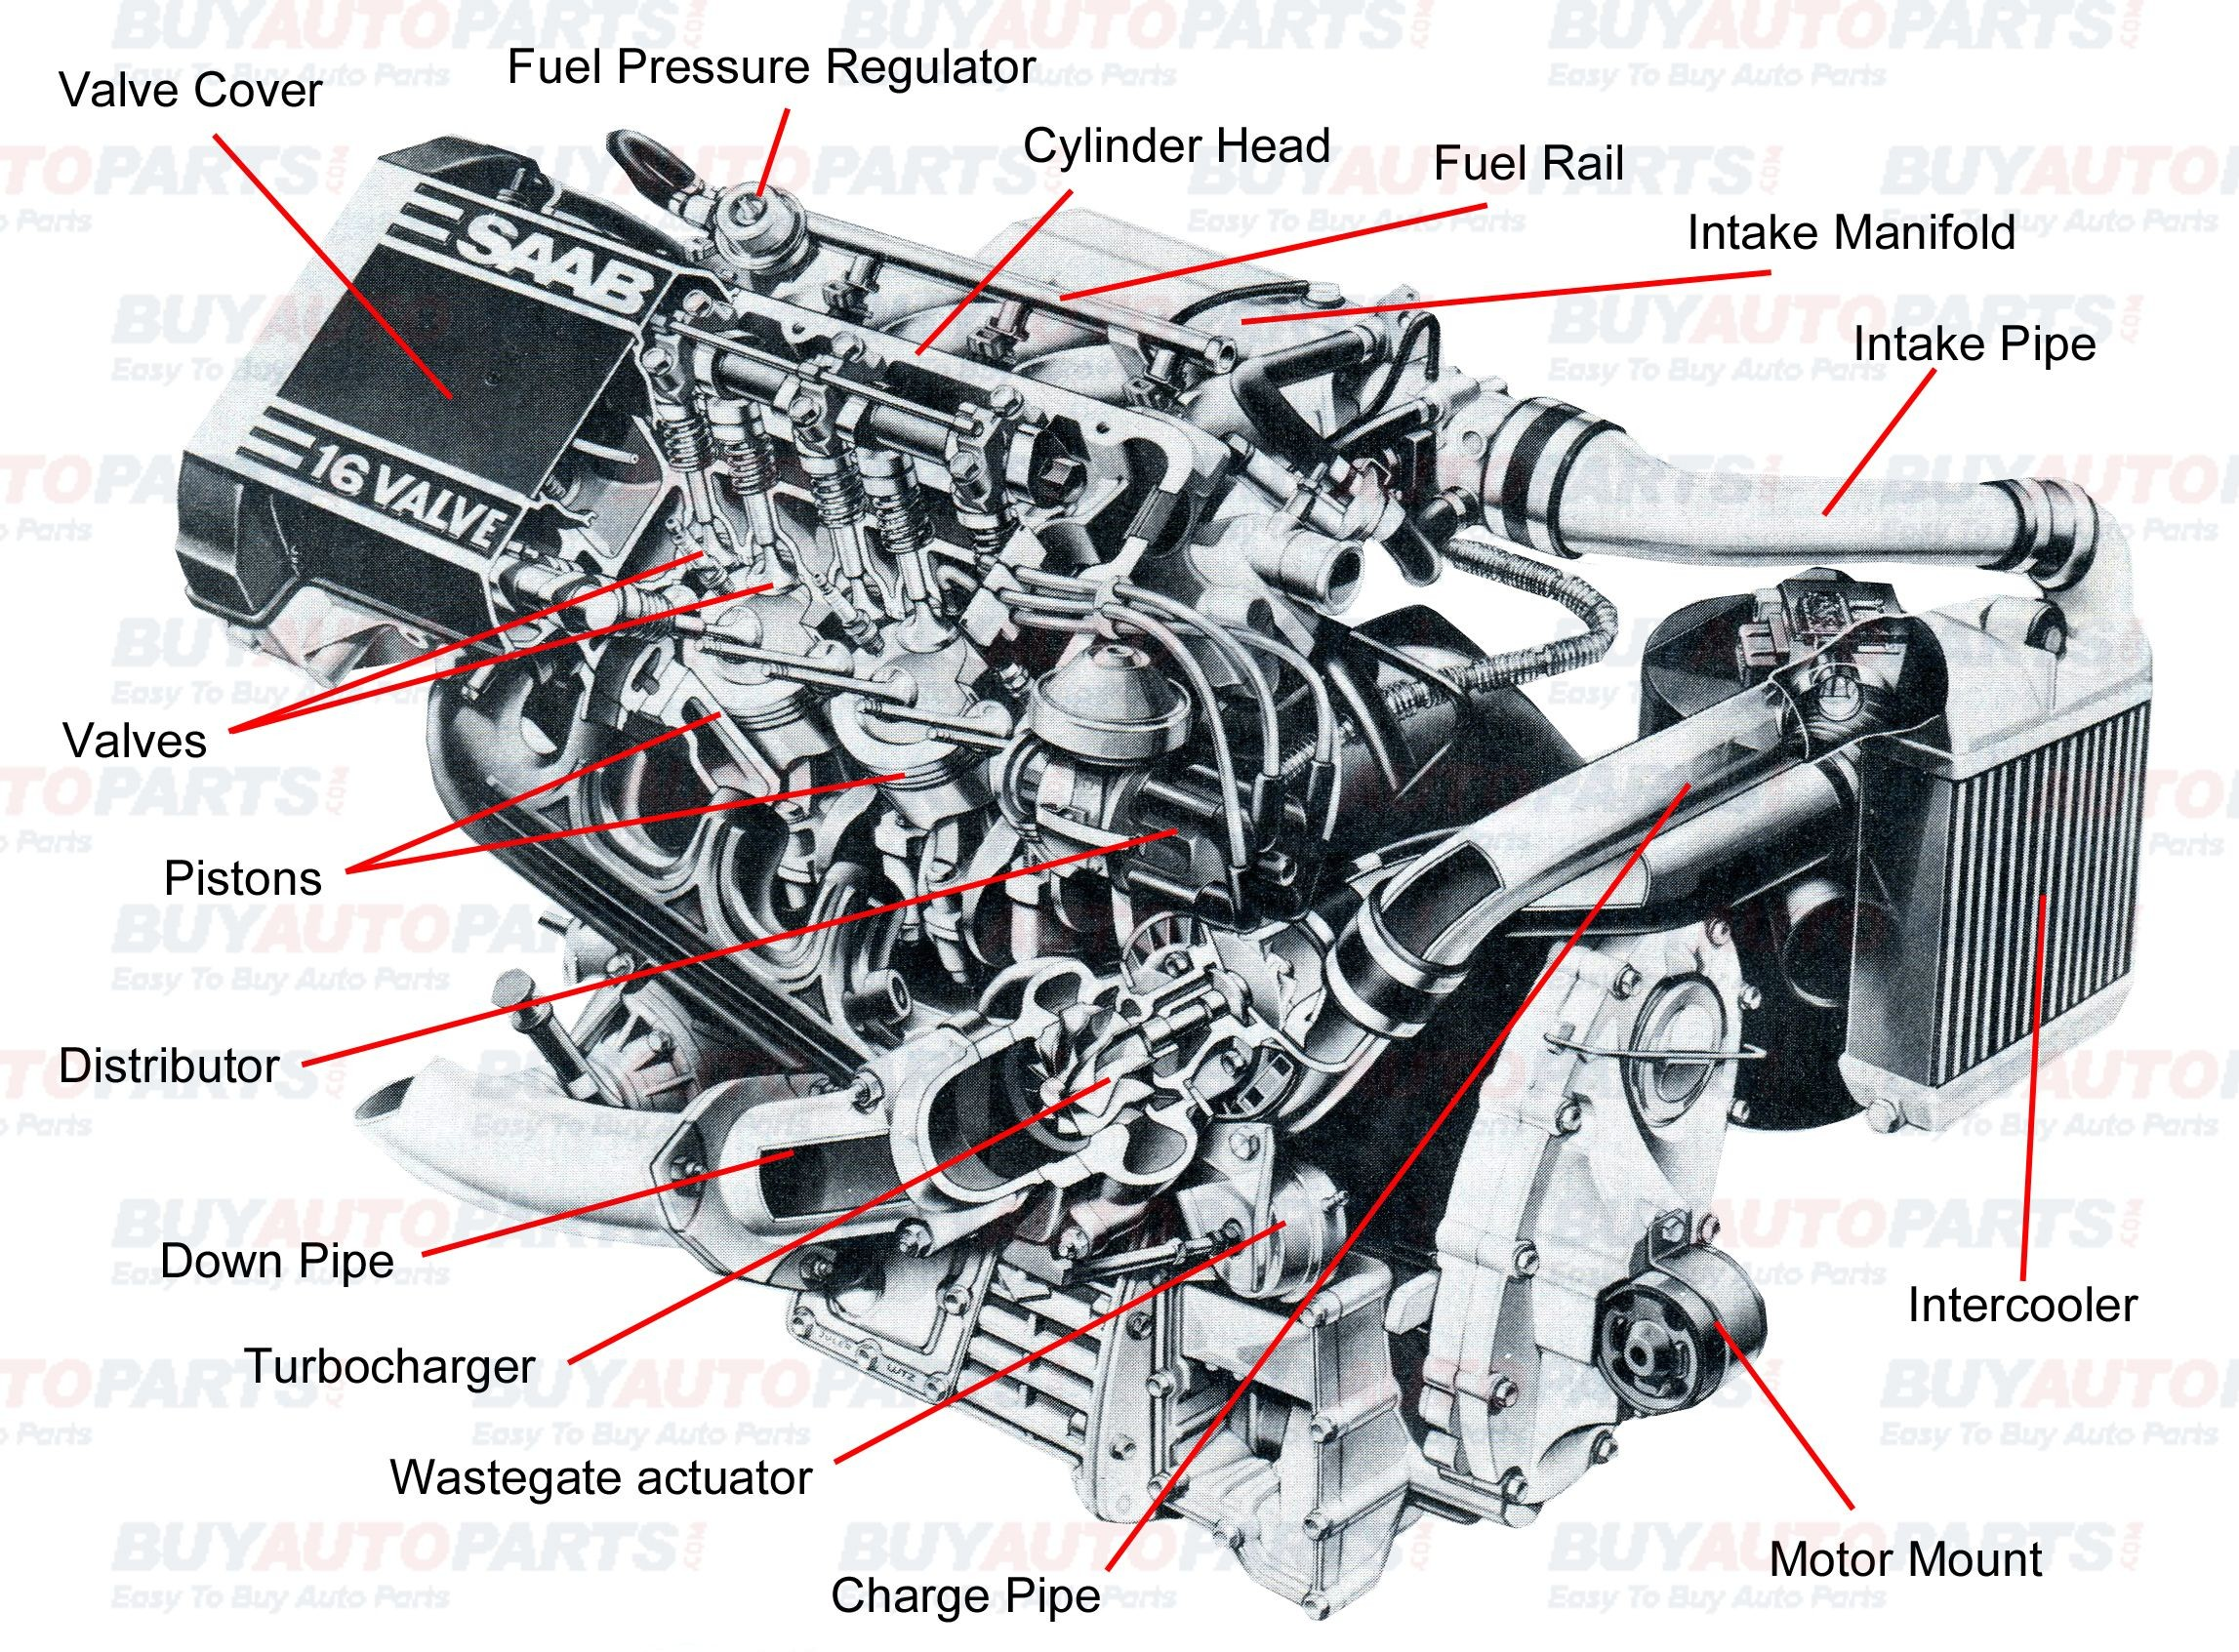 Car Part Diagram My Wiring Diagram